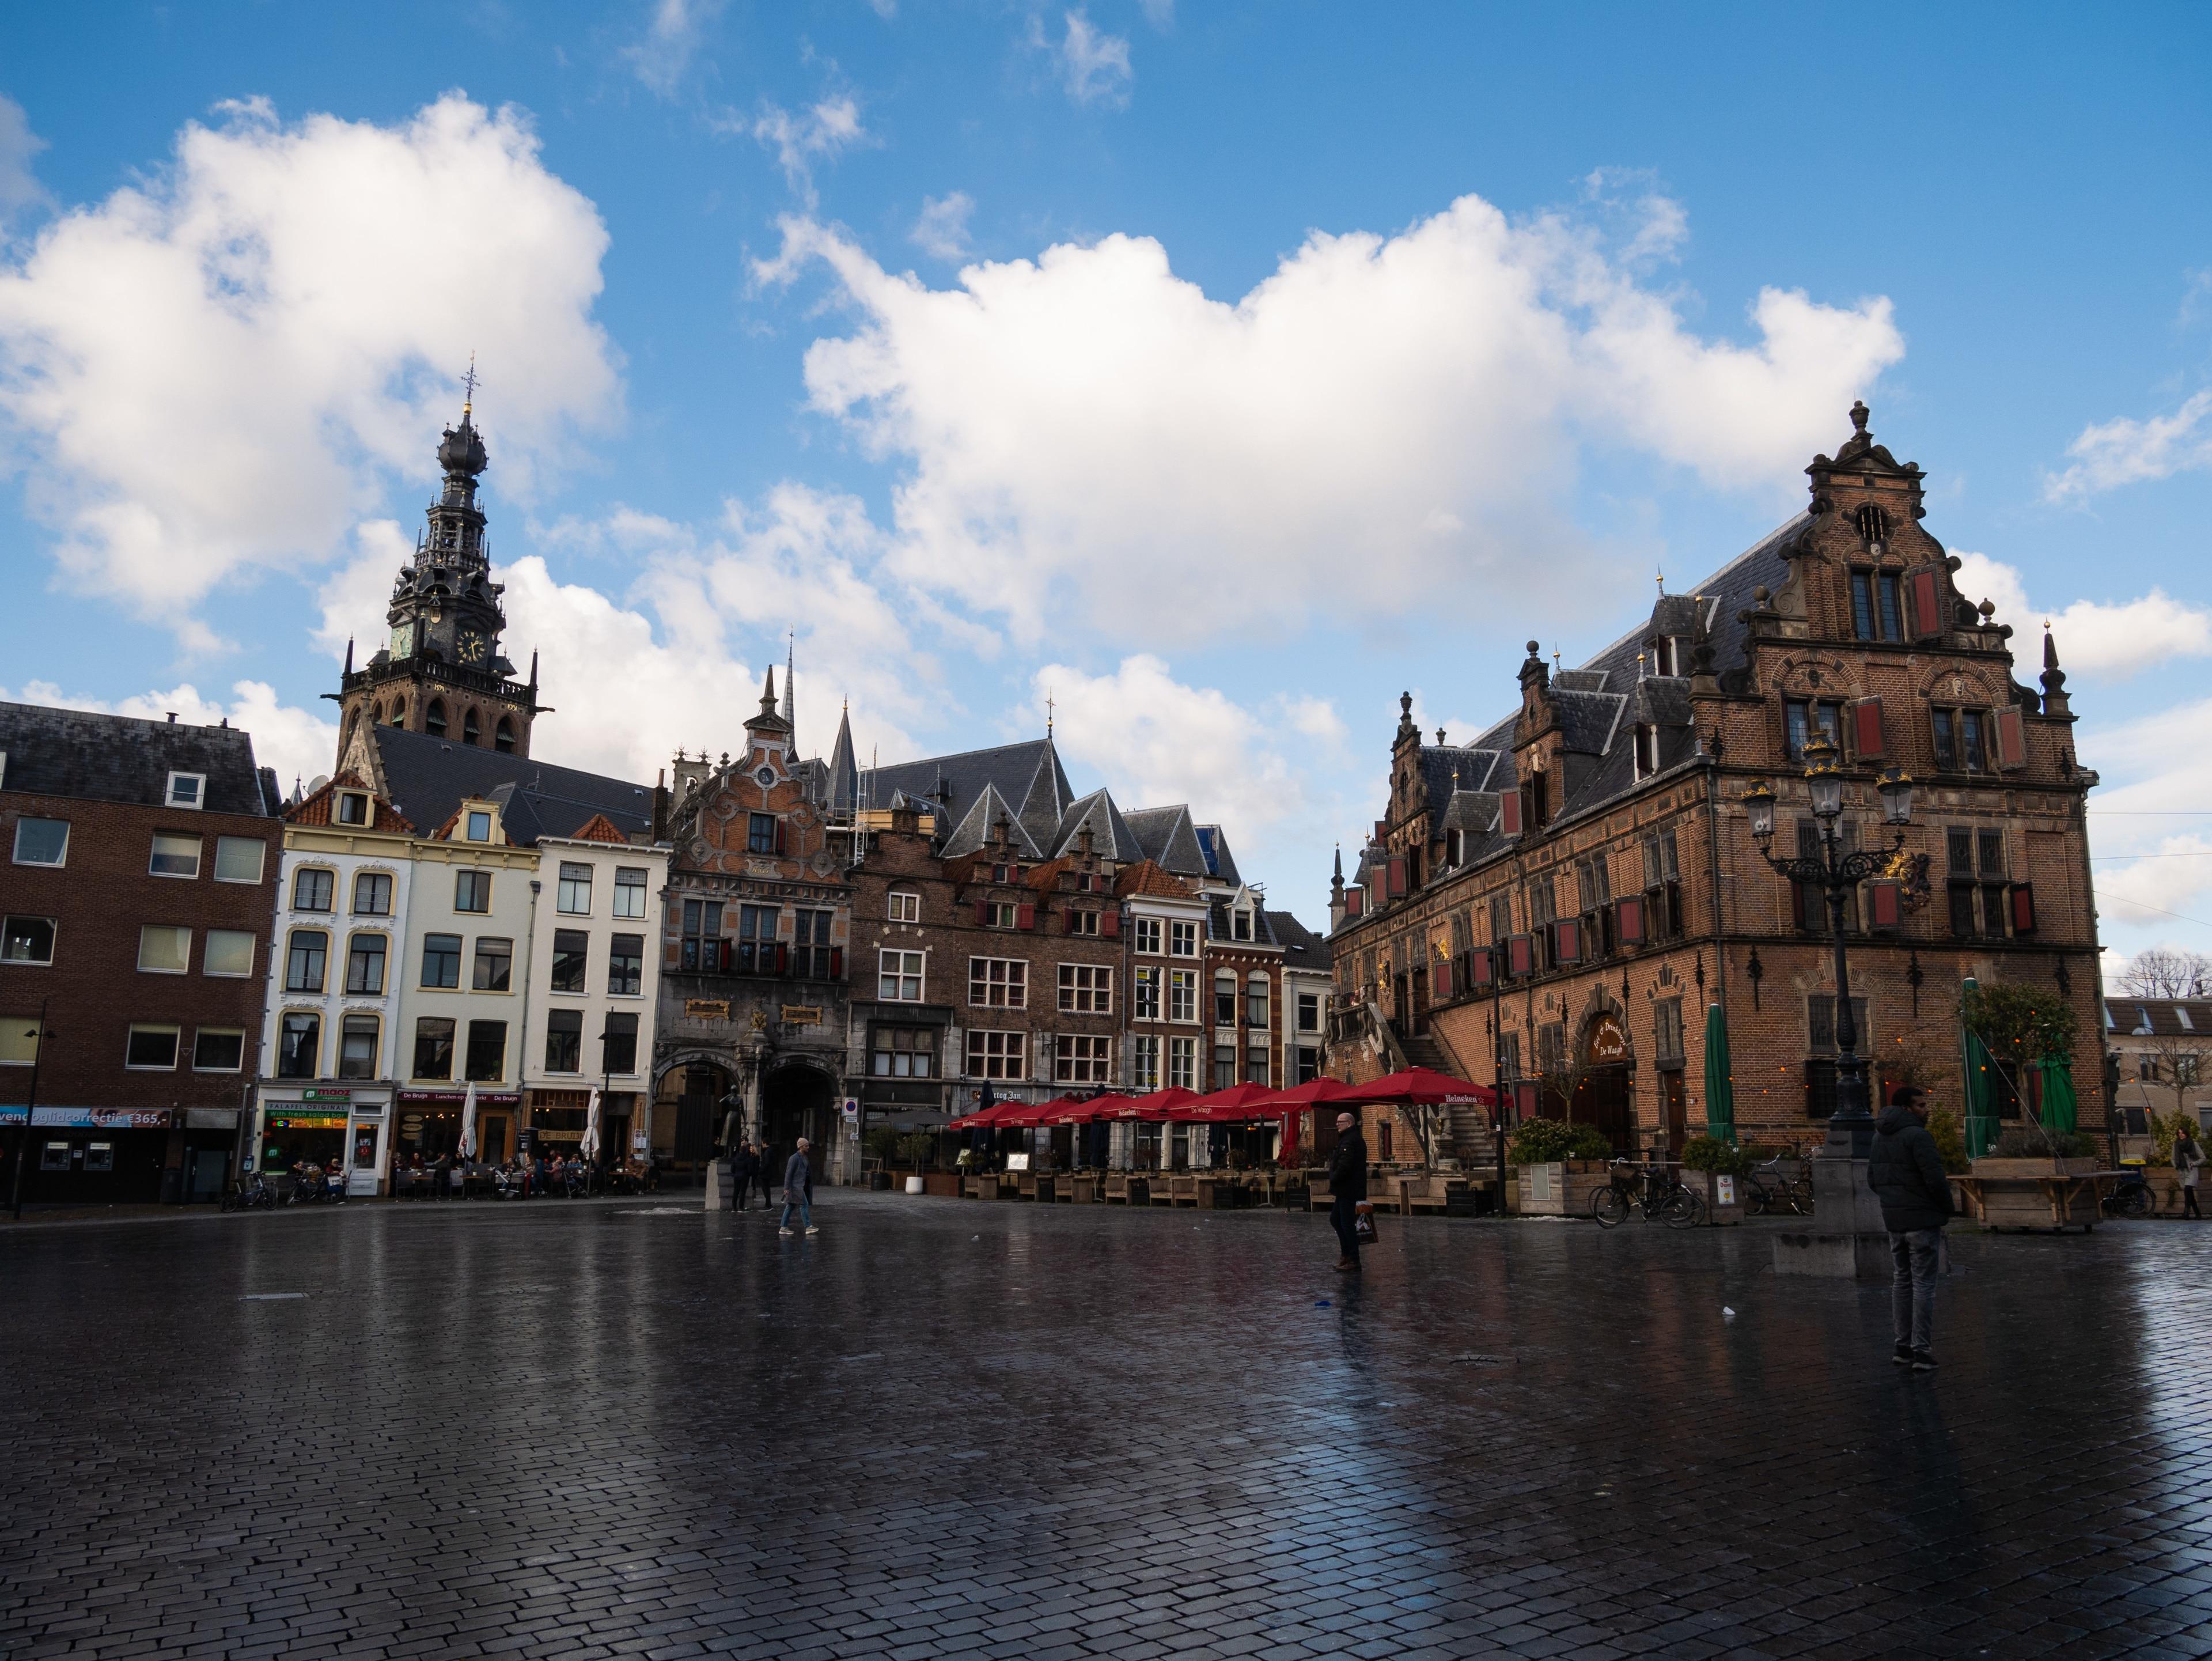 Betuwe, Gelderland, Niederlande